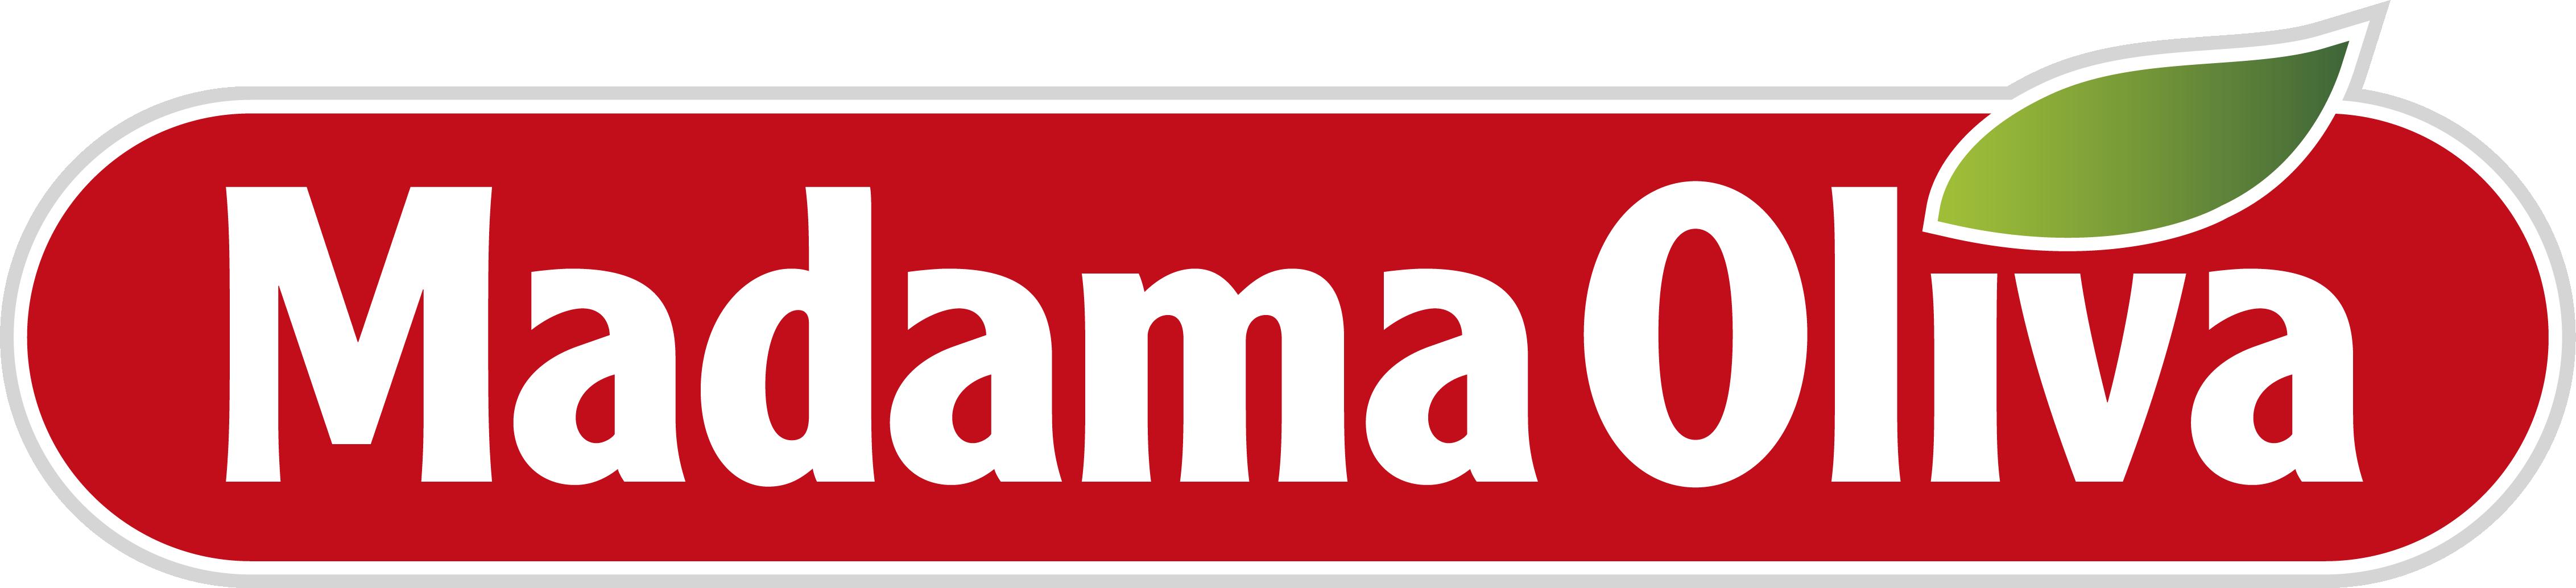 MADAMA LOGO 2019